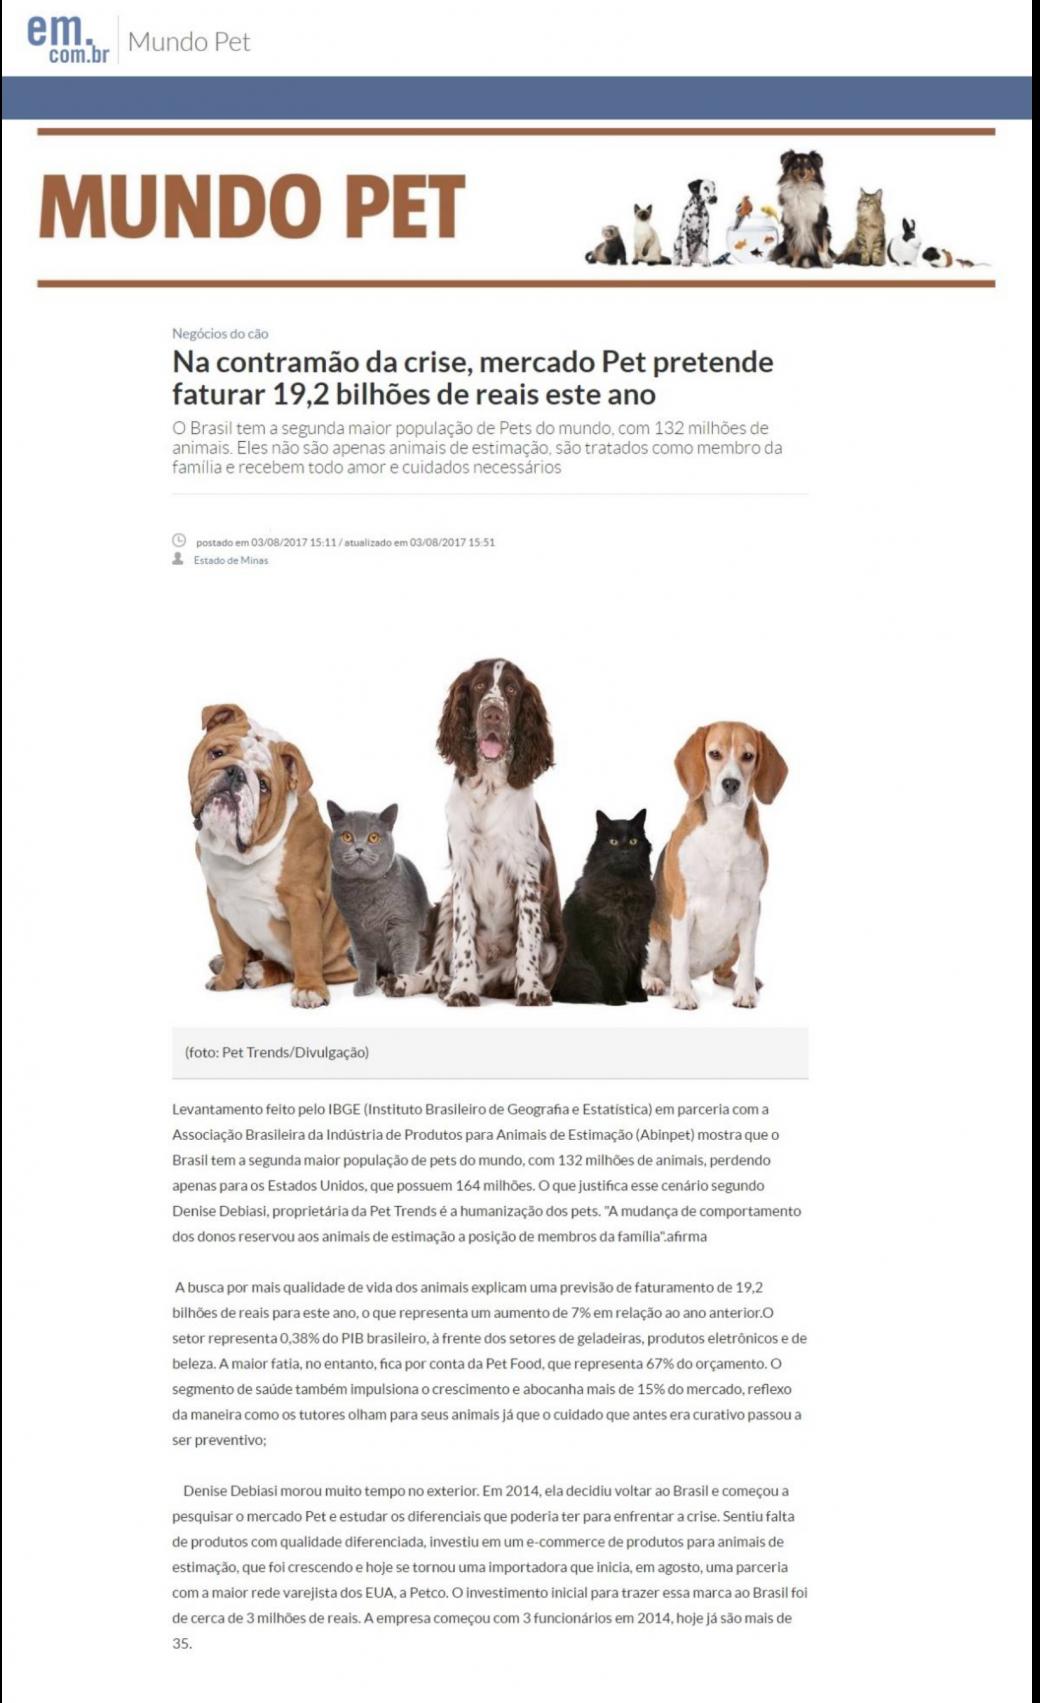 Estado de Minas fala sobre o Mercado Pet